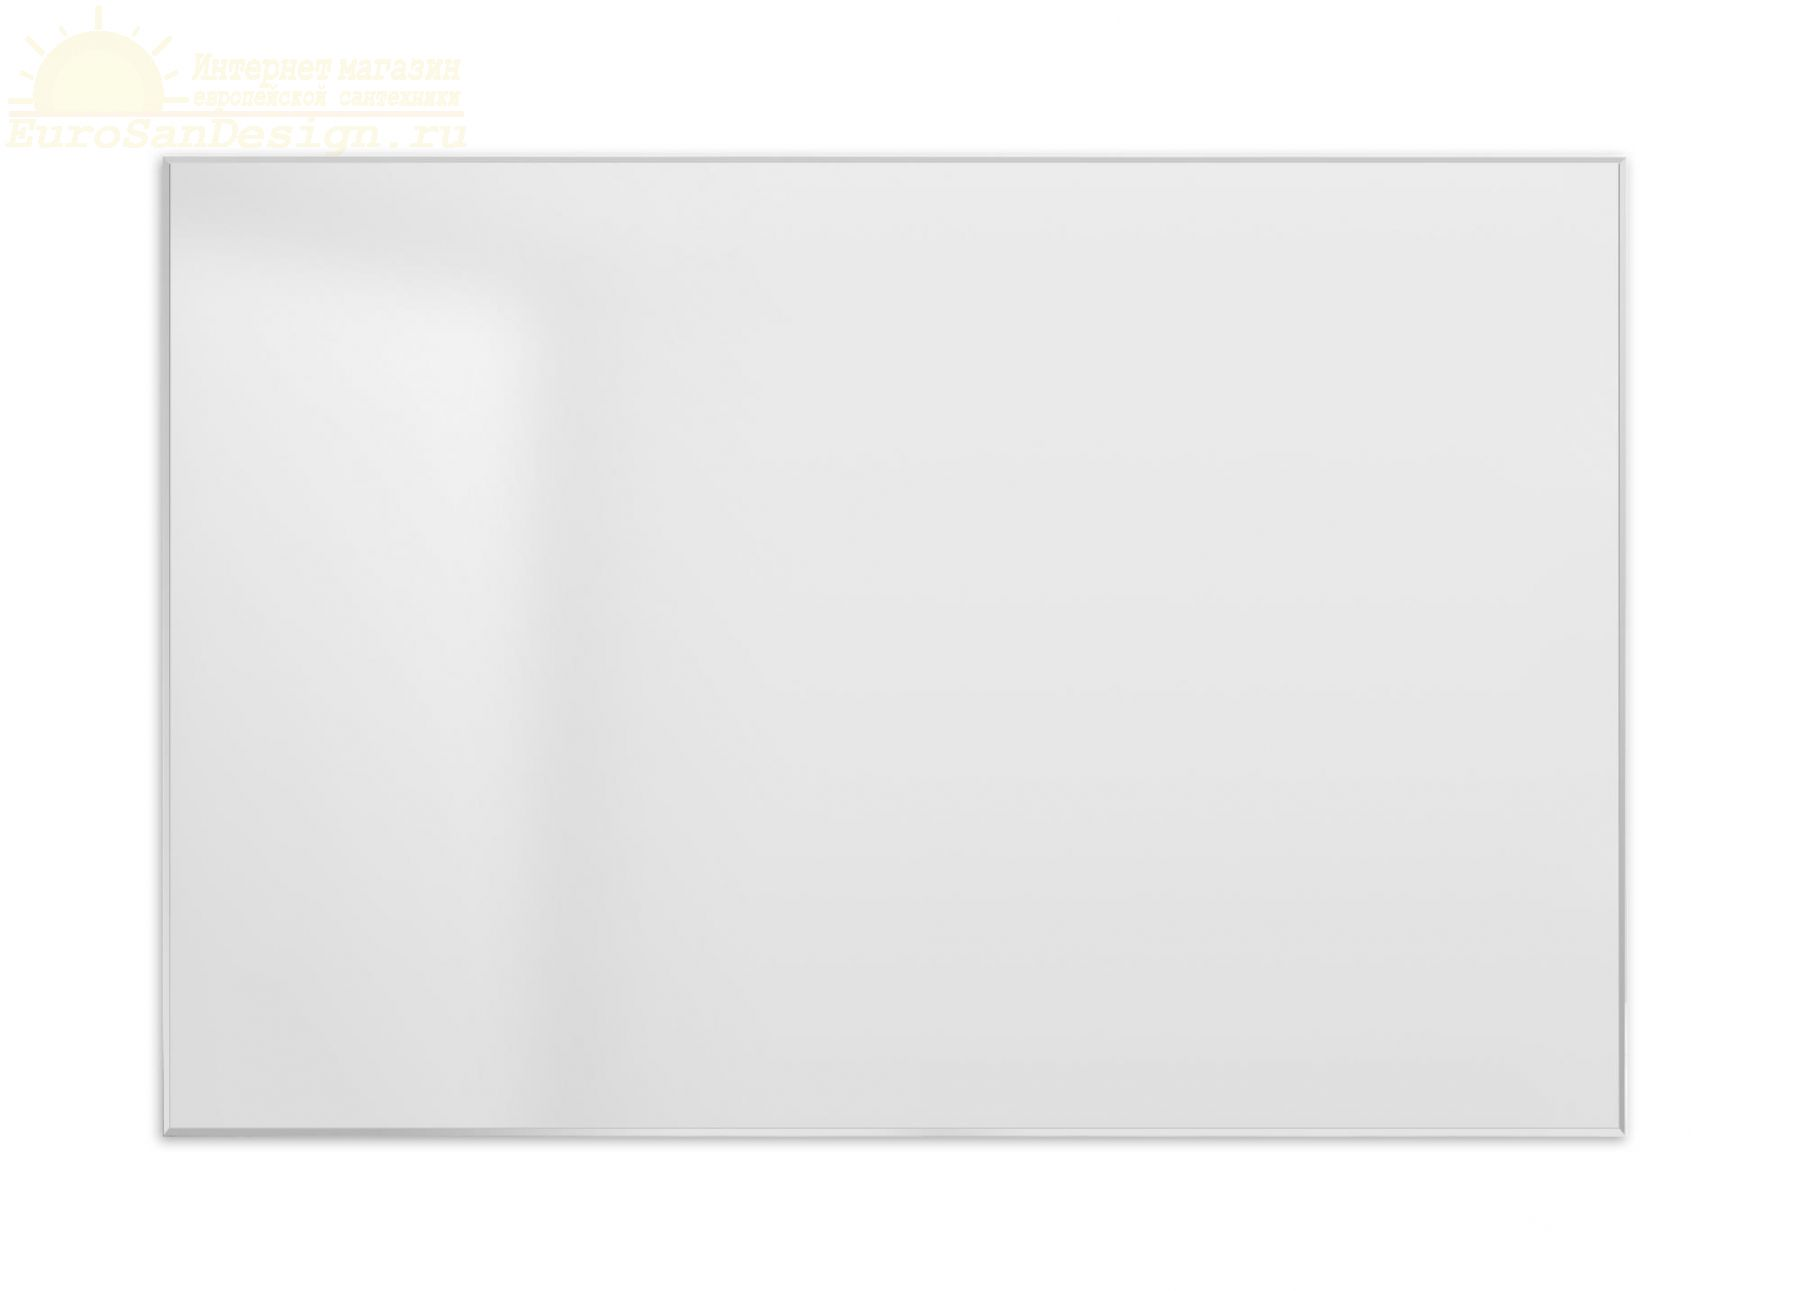 Зеркало для ванной комнаты BelBagno SPC-AL-1200-800 ФОТО